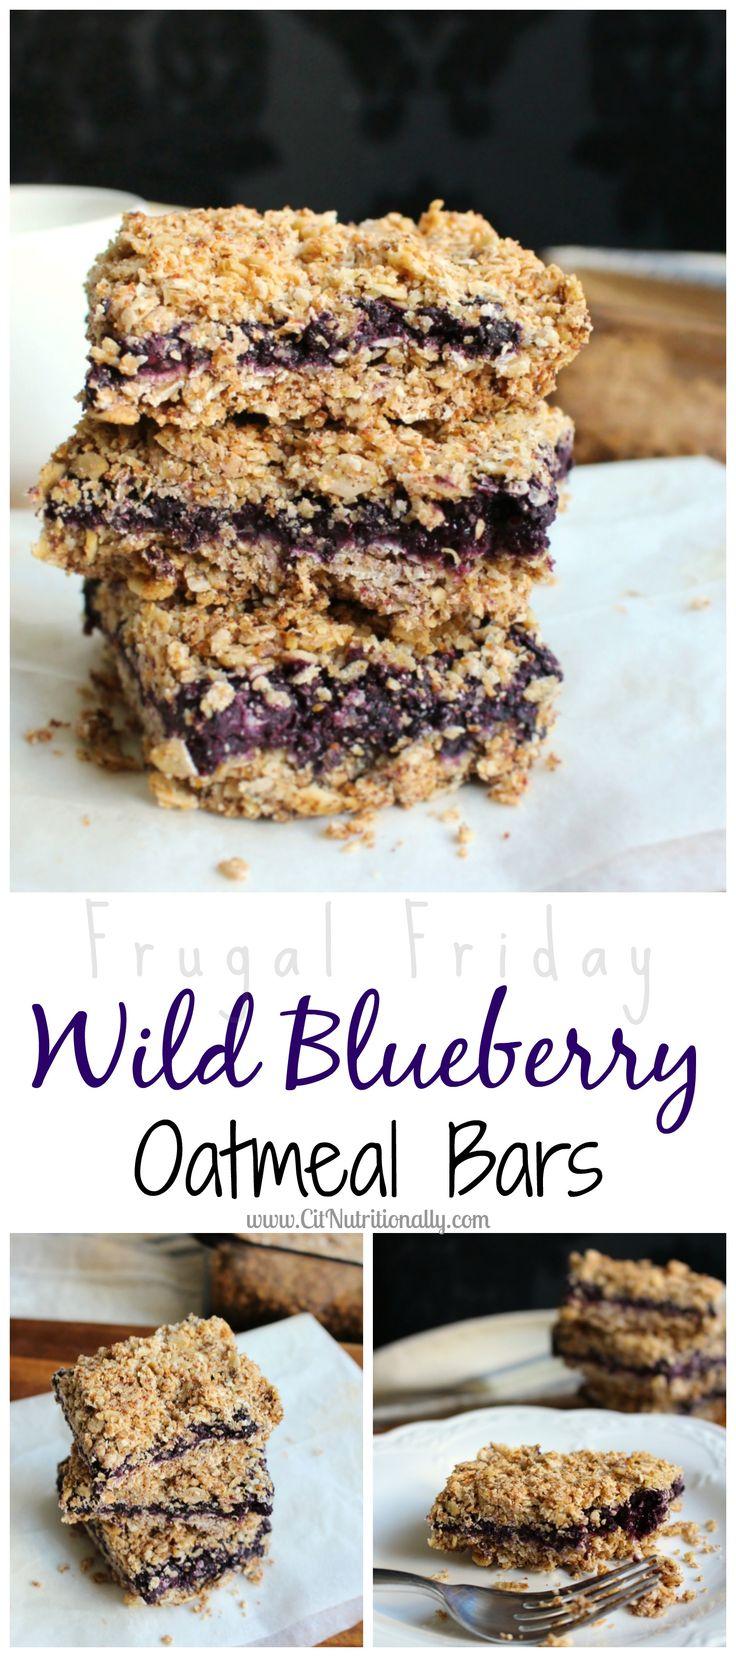 {Frugal Friday} Wild Blueberry Oatmeal Bars | C it Nutritionally #vegan #glutenfree #lowfodmap